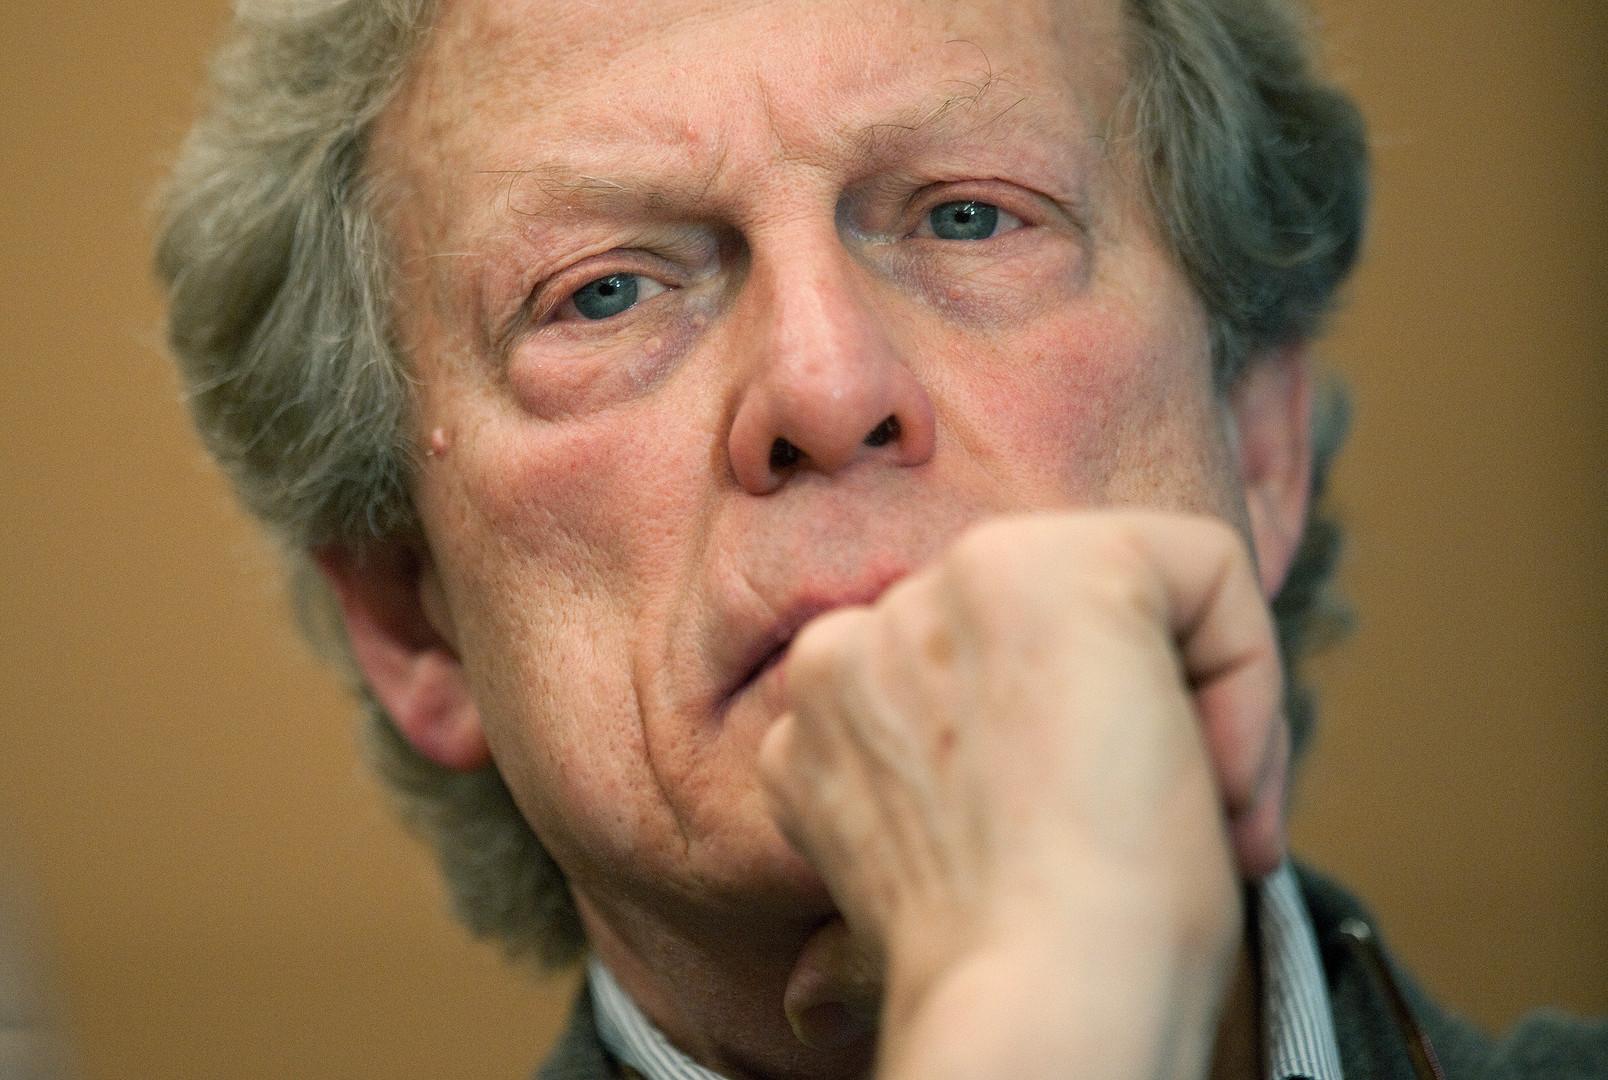 Наставник разоблачителя: ушёл из жизни директор WikiLeaks Гэвин Макфэйдьен